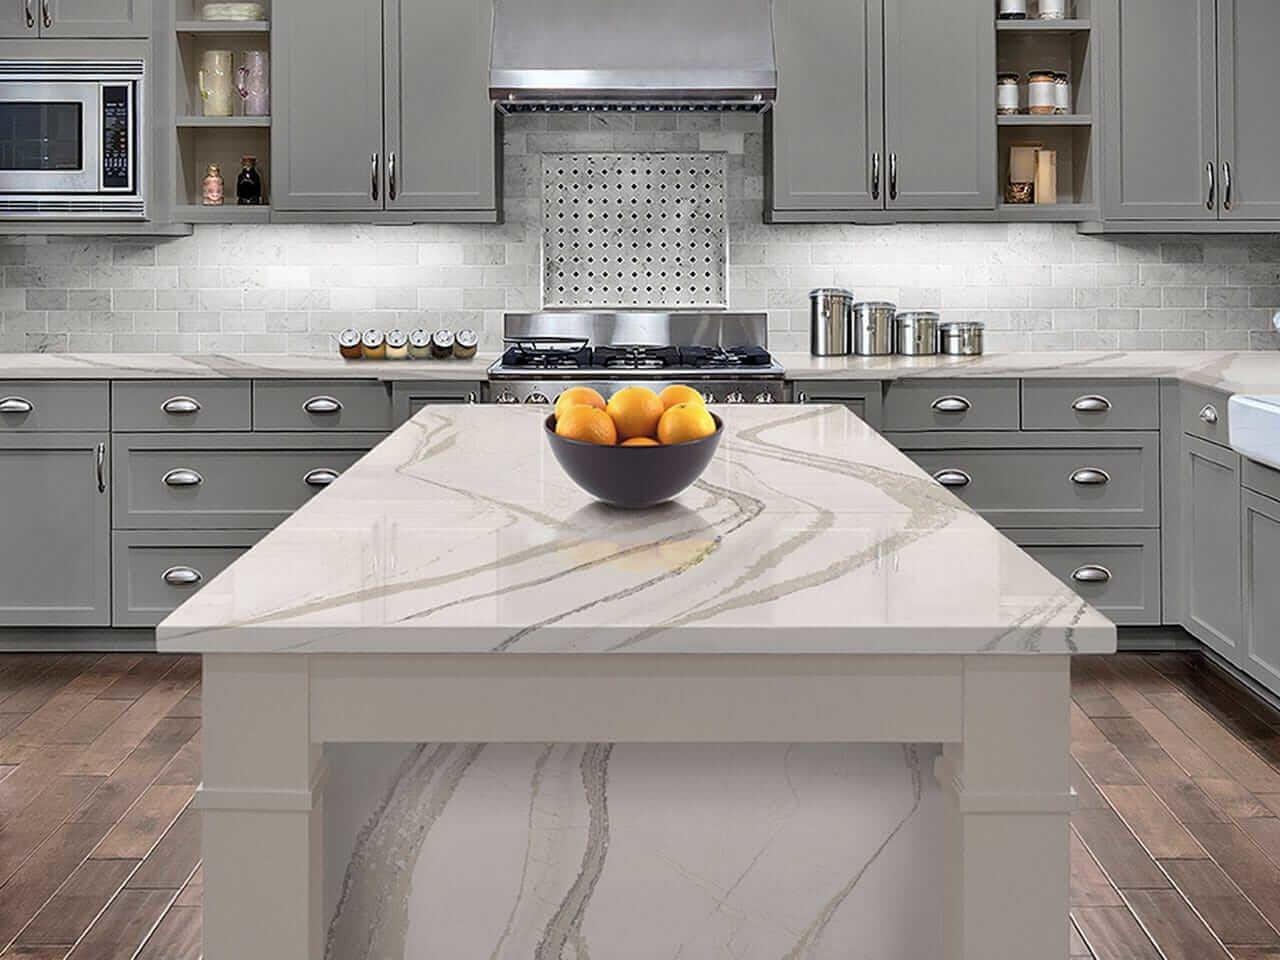 Brittannicca Cambria Quartz Countertops Cost Reviews Kitchen Remodel Countertops Replacing Kitchen Countertops Kitchen Remodel